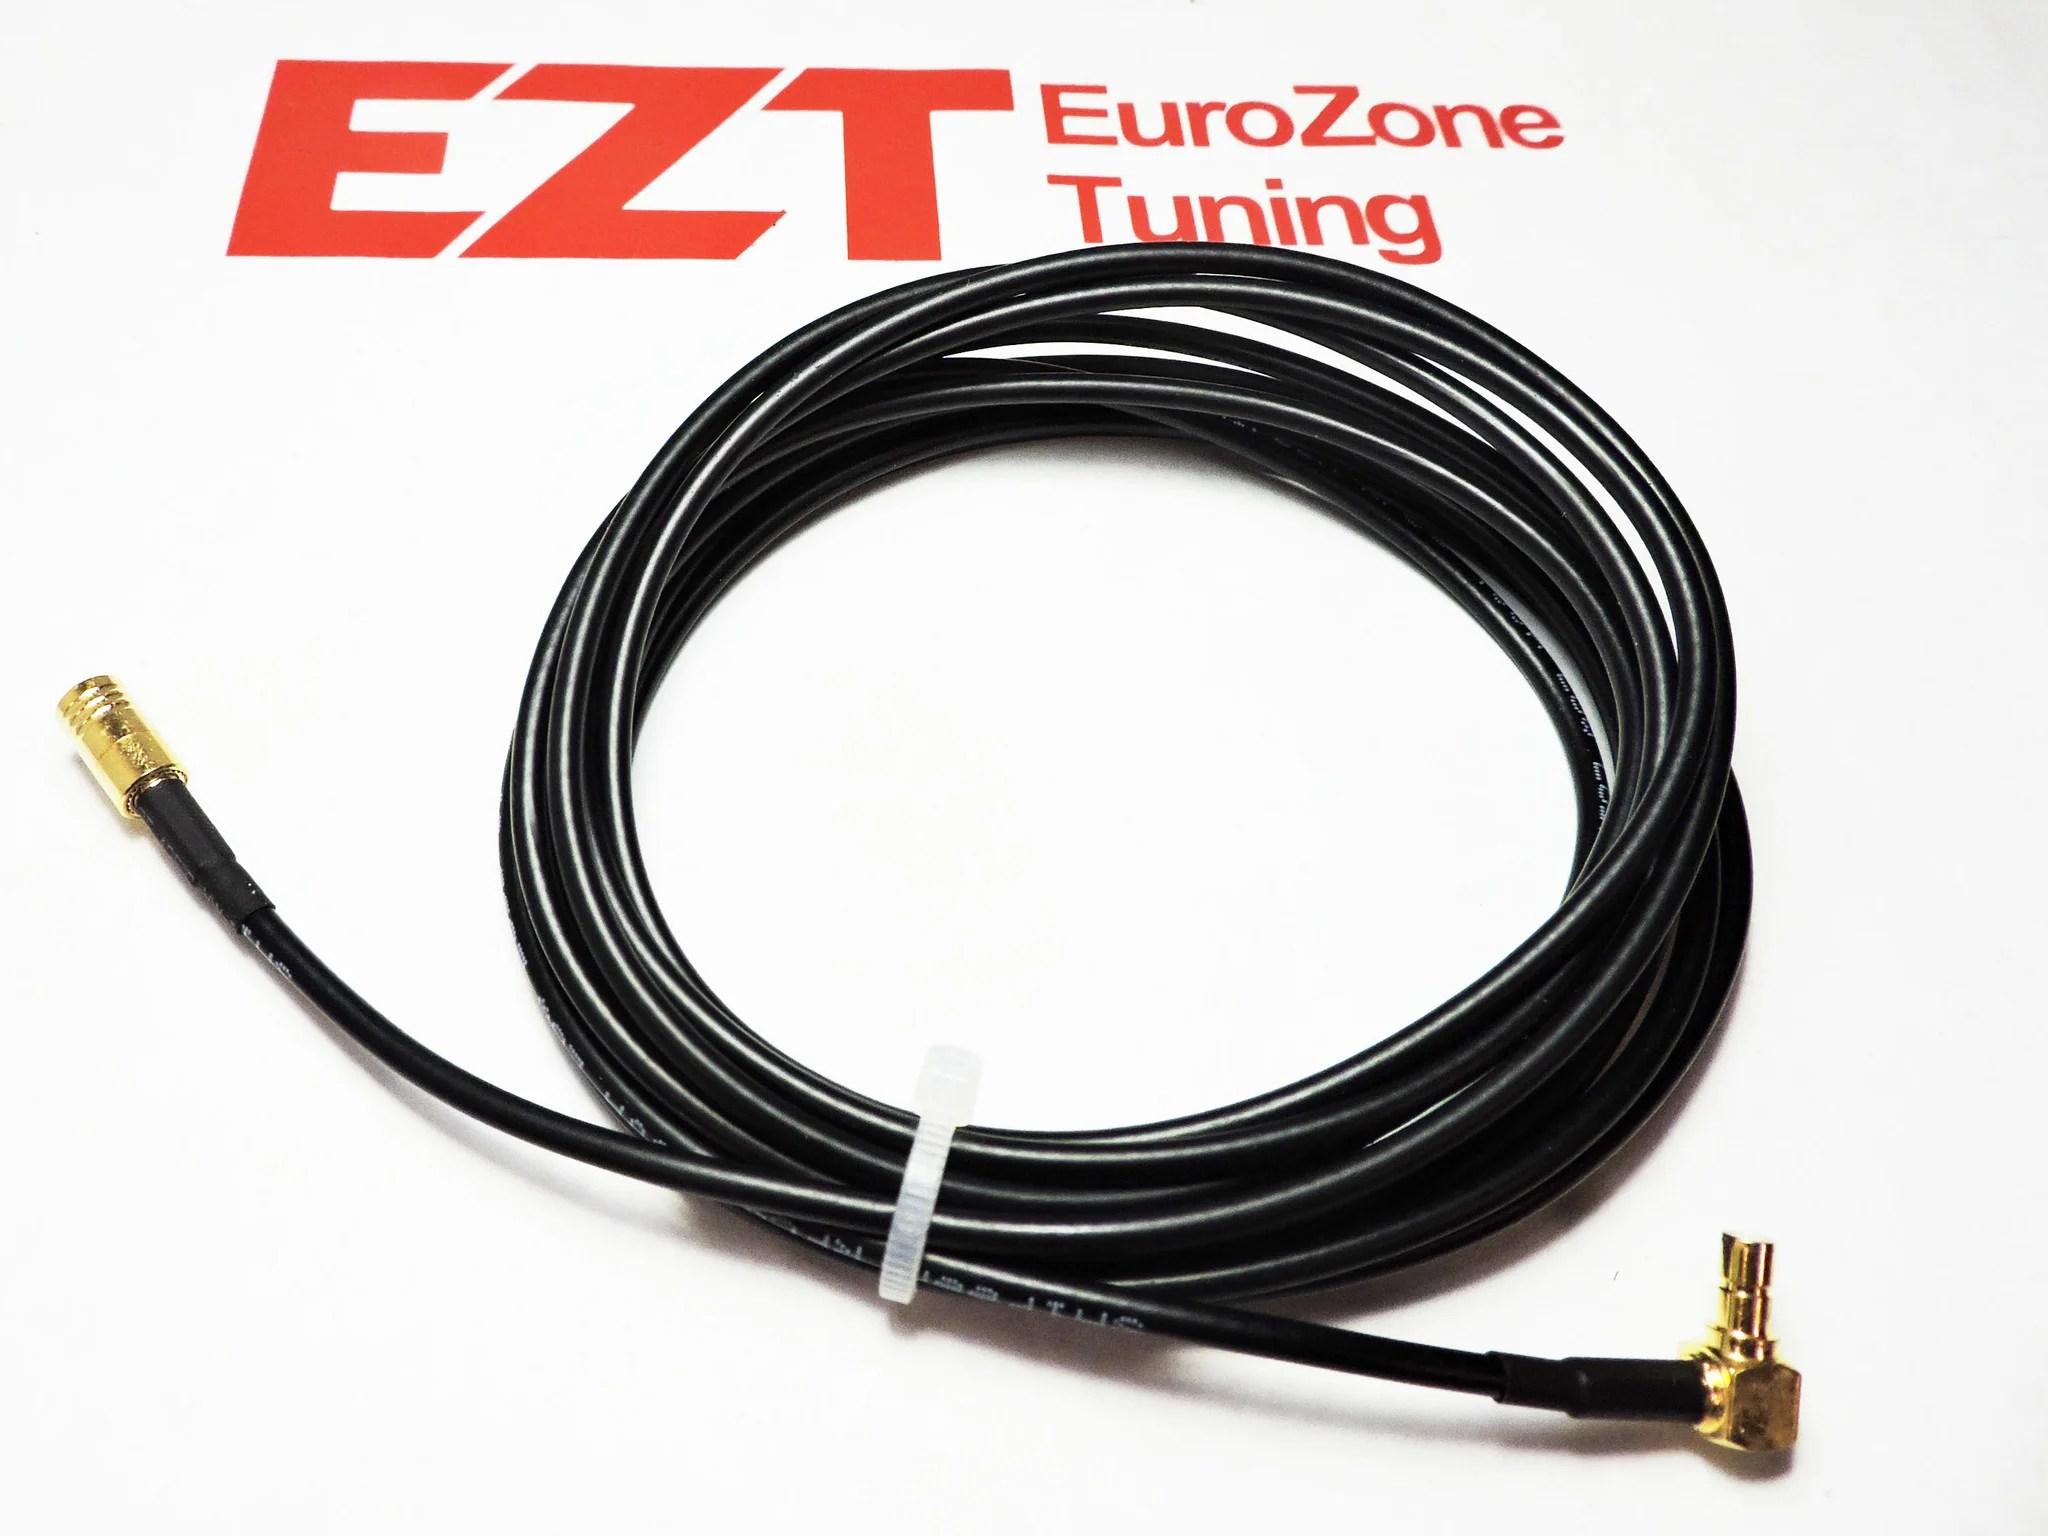 medium resolution of vw sirius radio extension cable